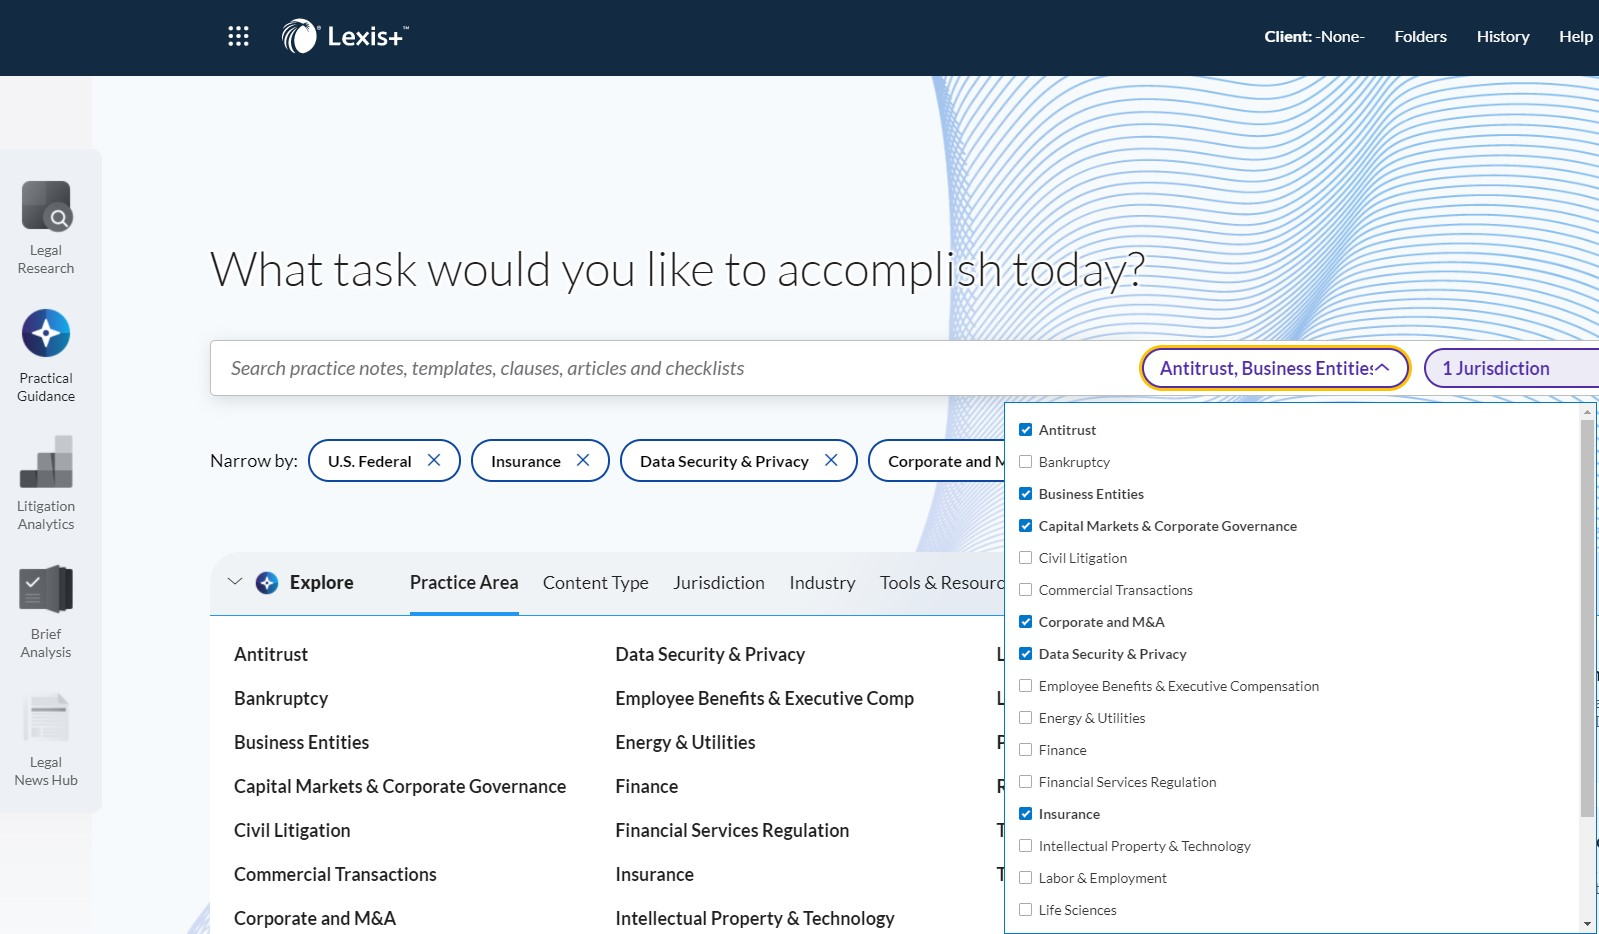 Screenshot image of Lexis Practical Guidance